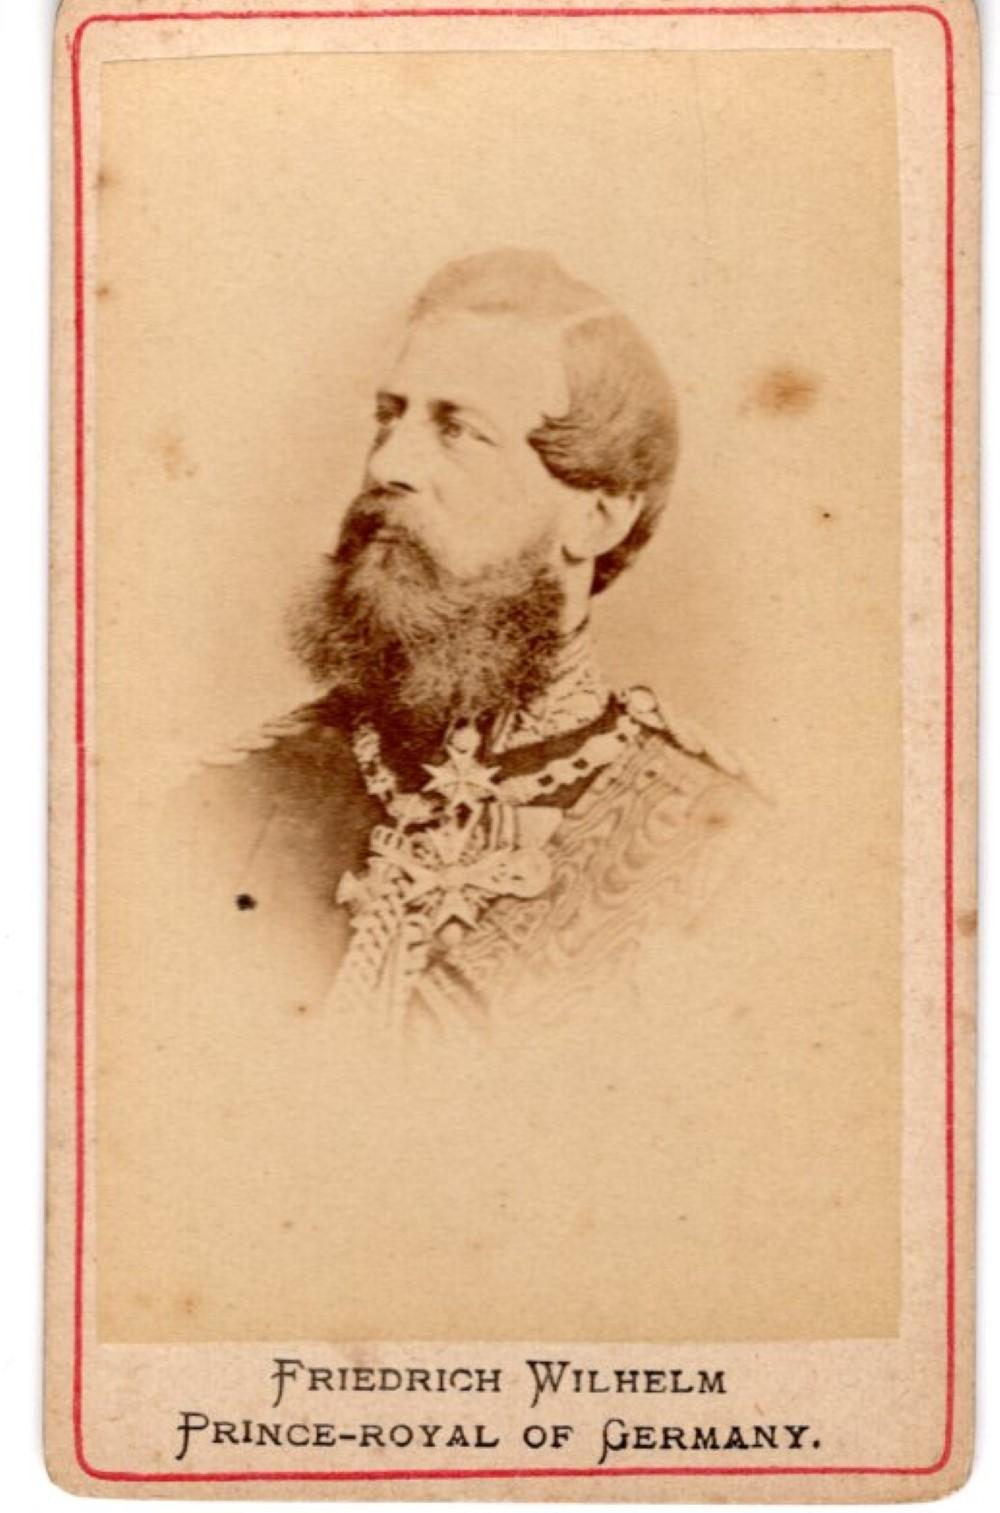 Friedrich Wilhelm, 1870s CDV